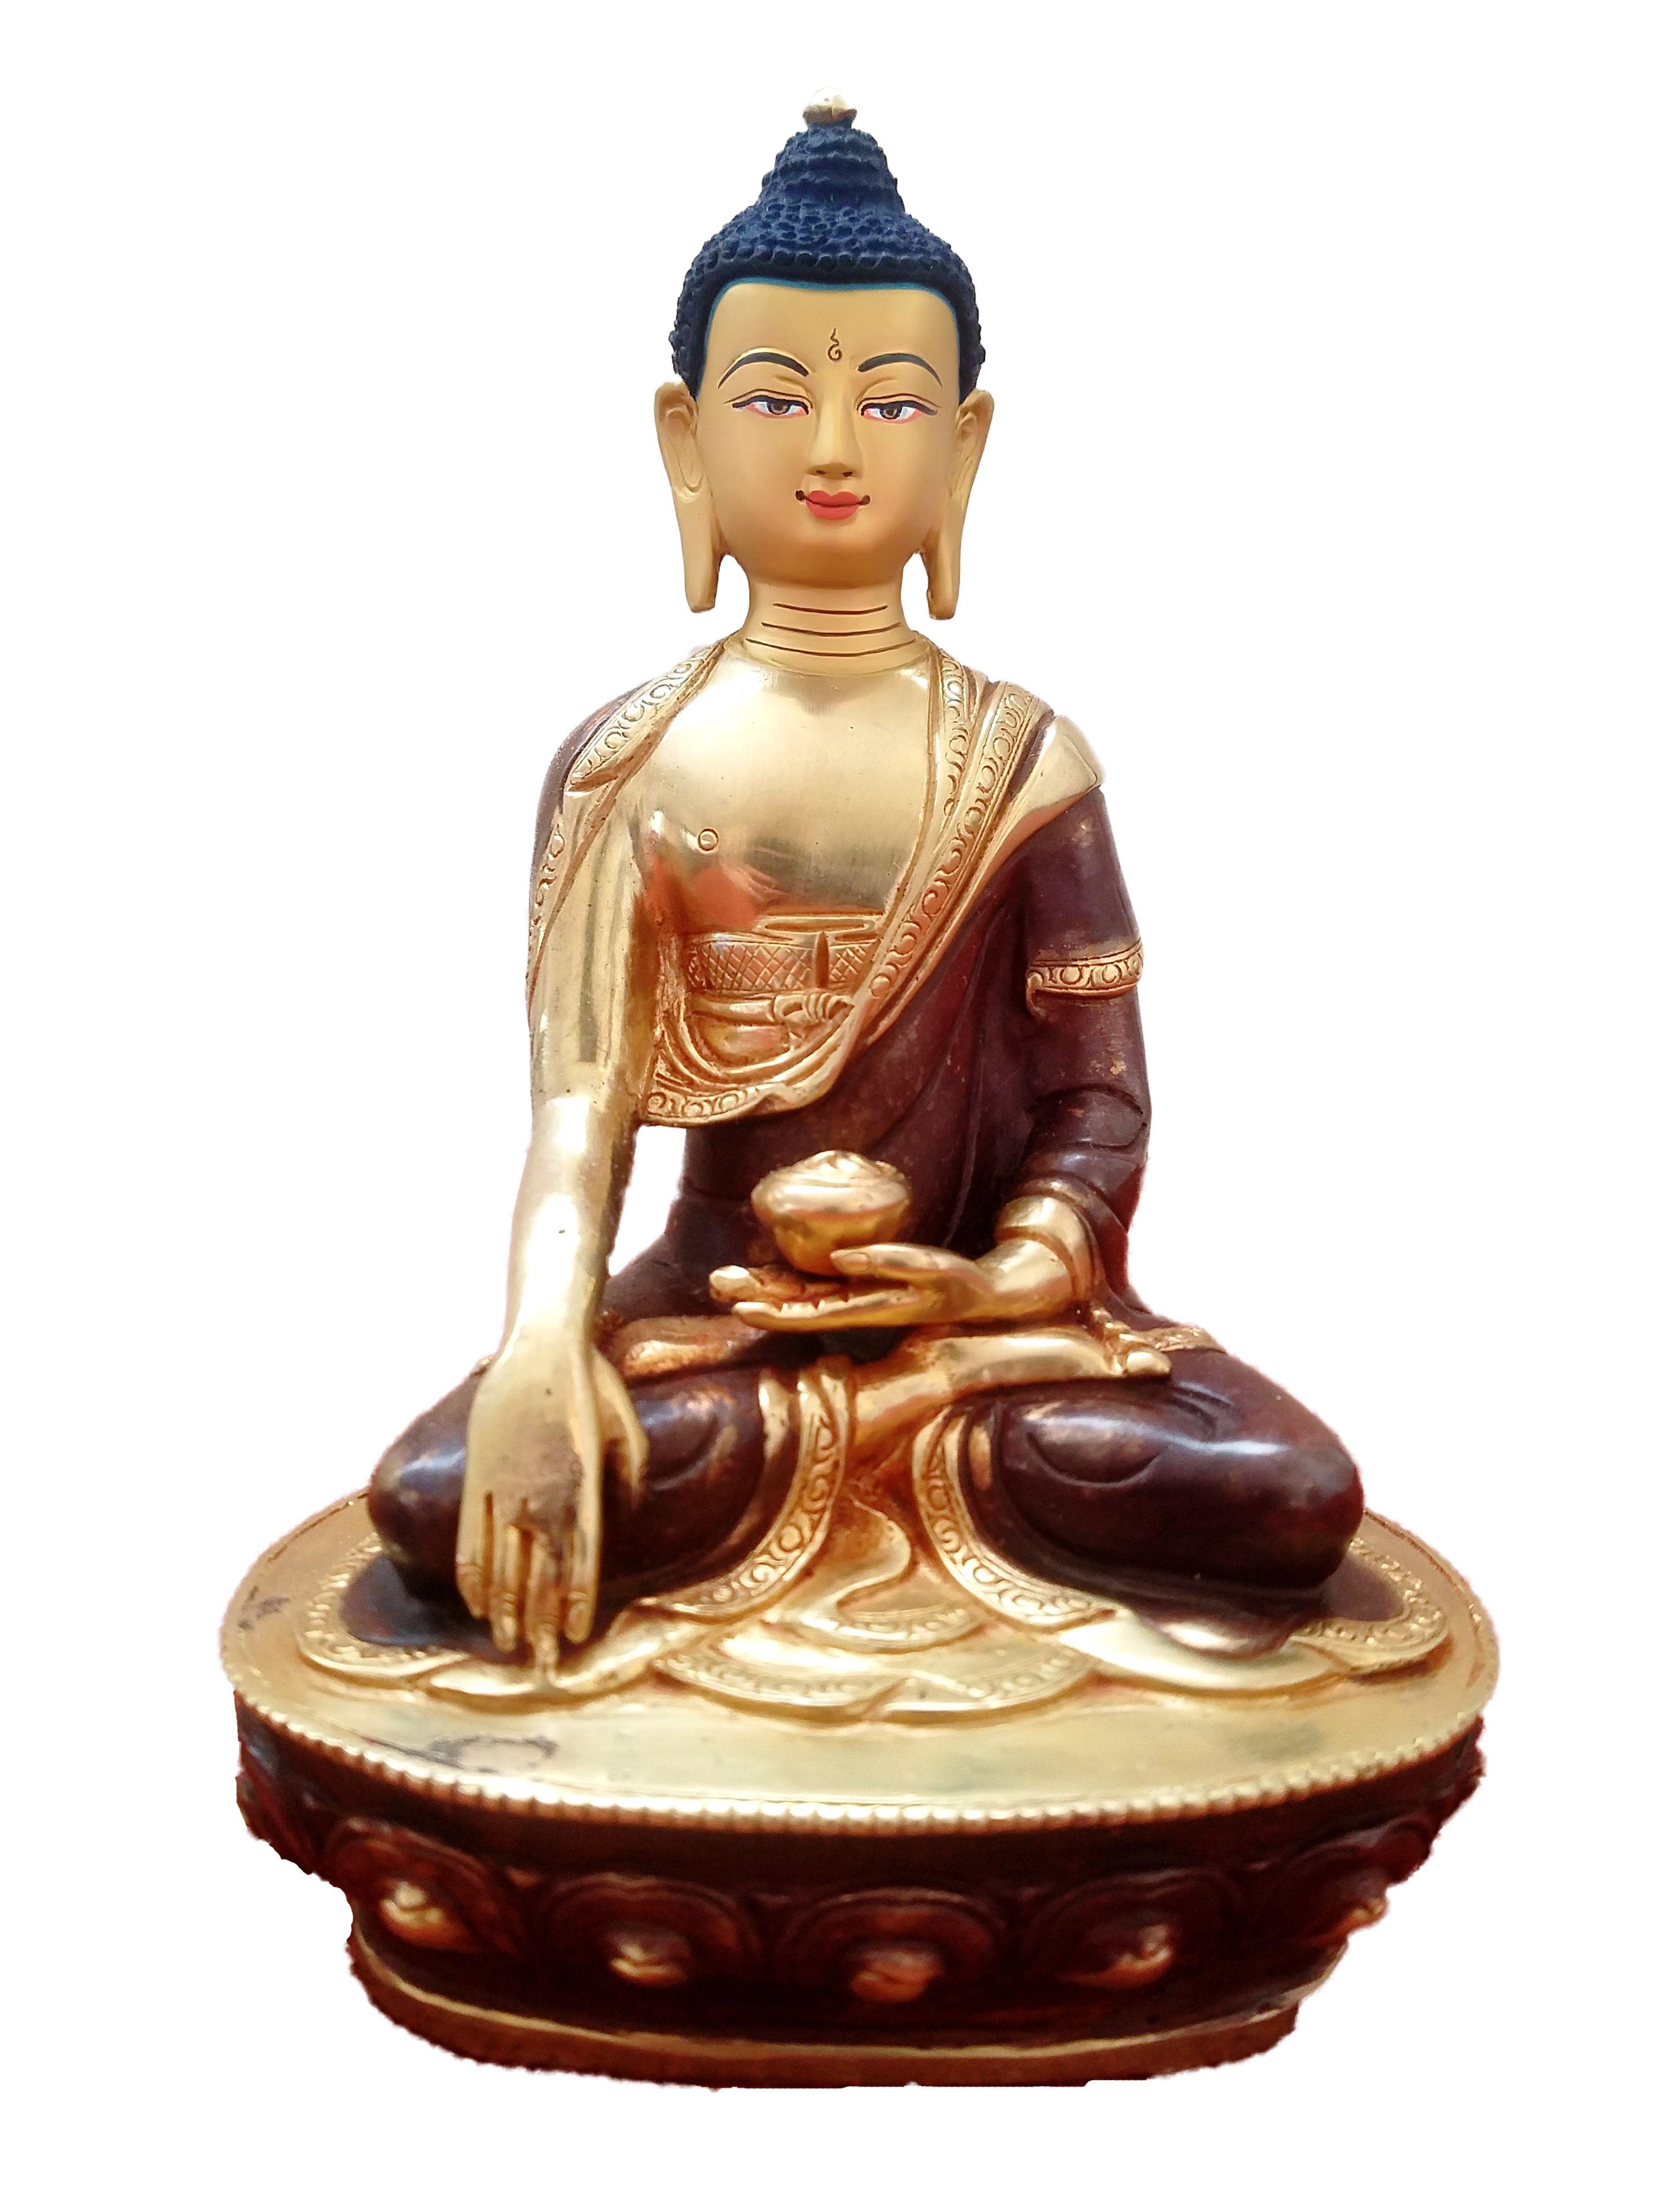 Buddhist And Hindu God And Goddess Figures For Worshipping And